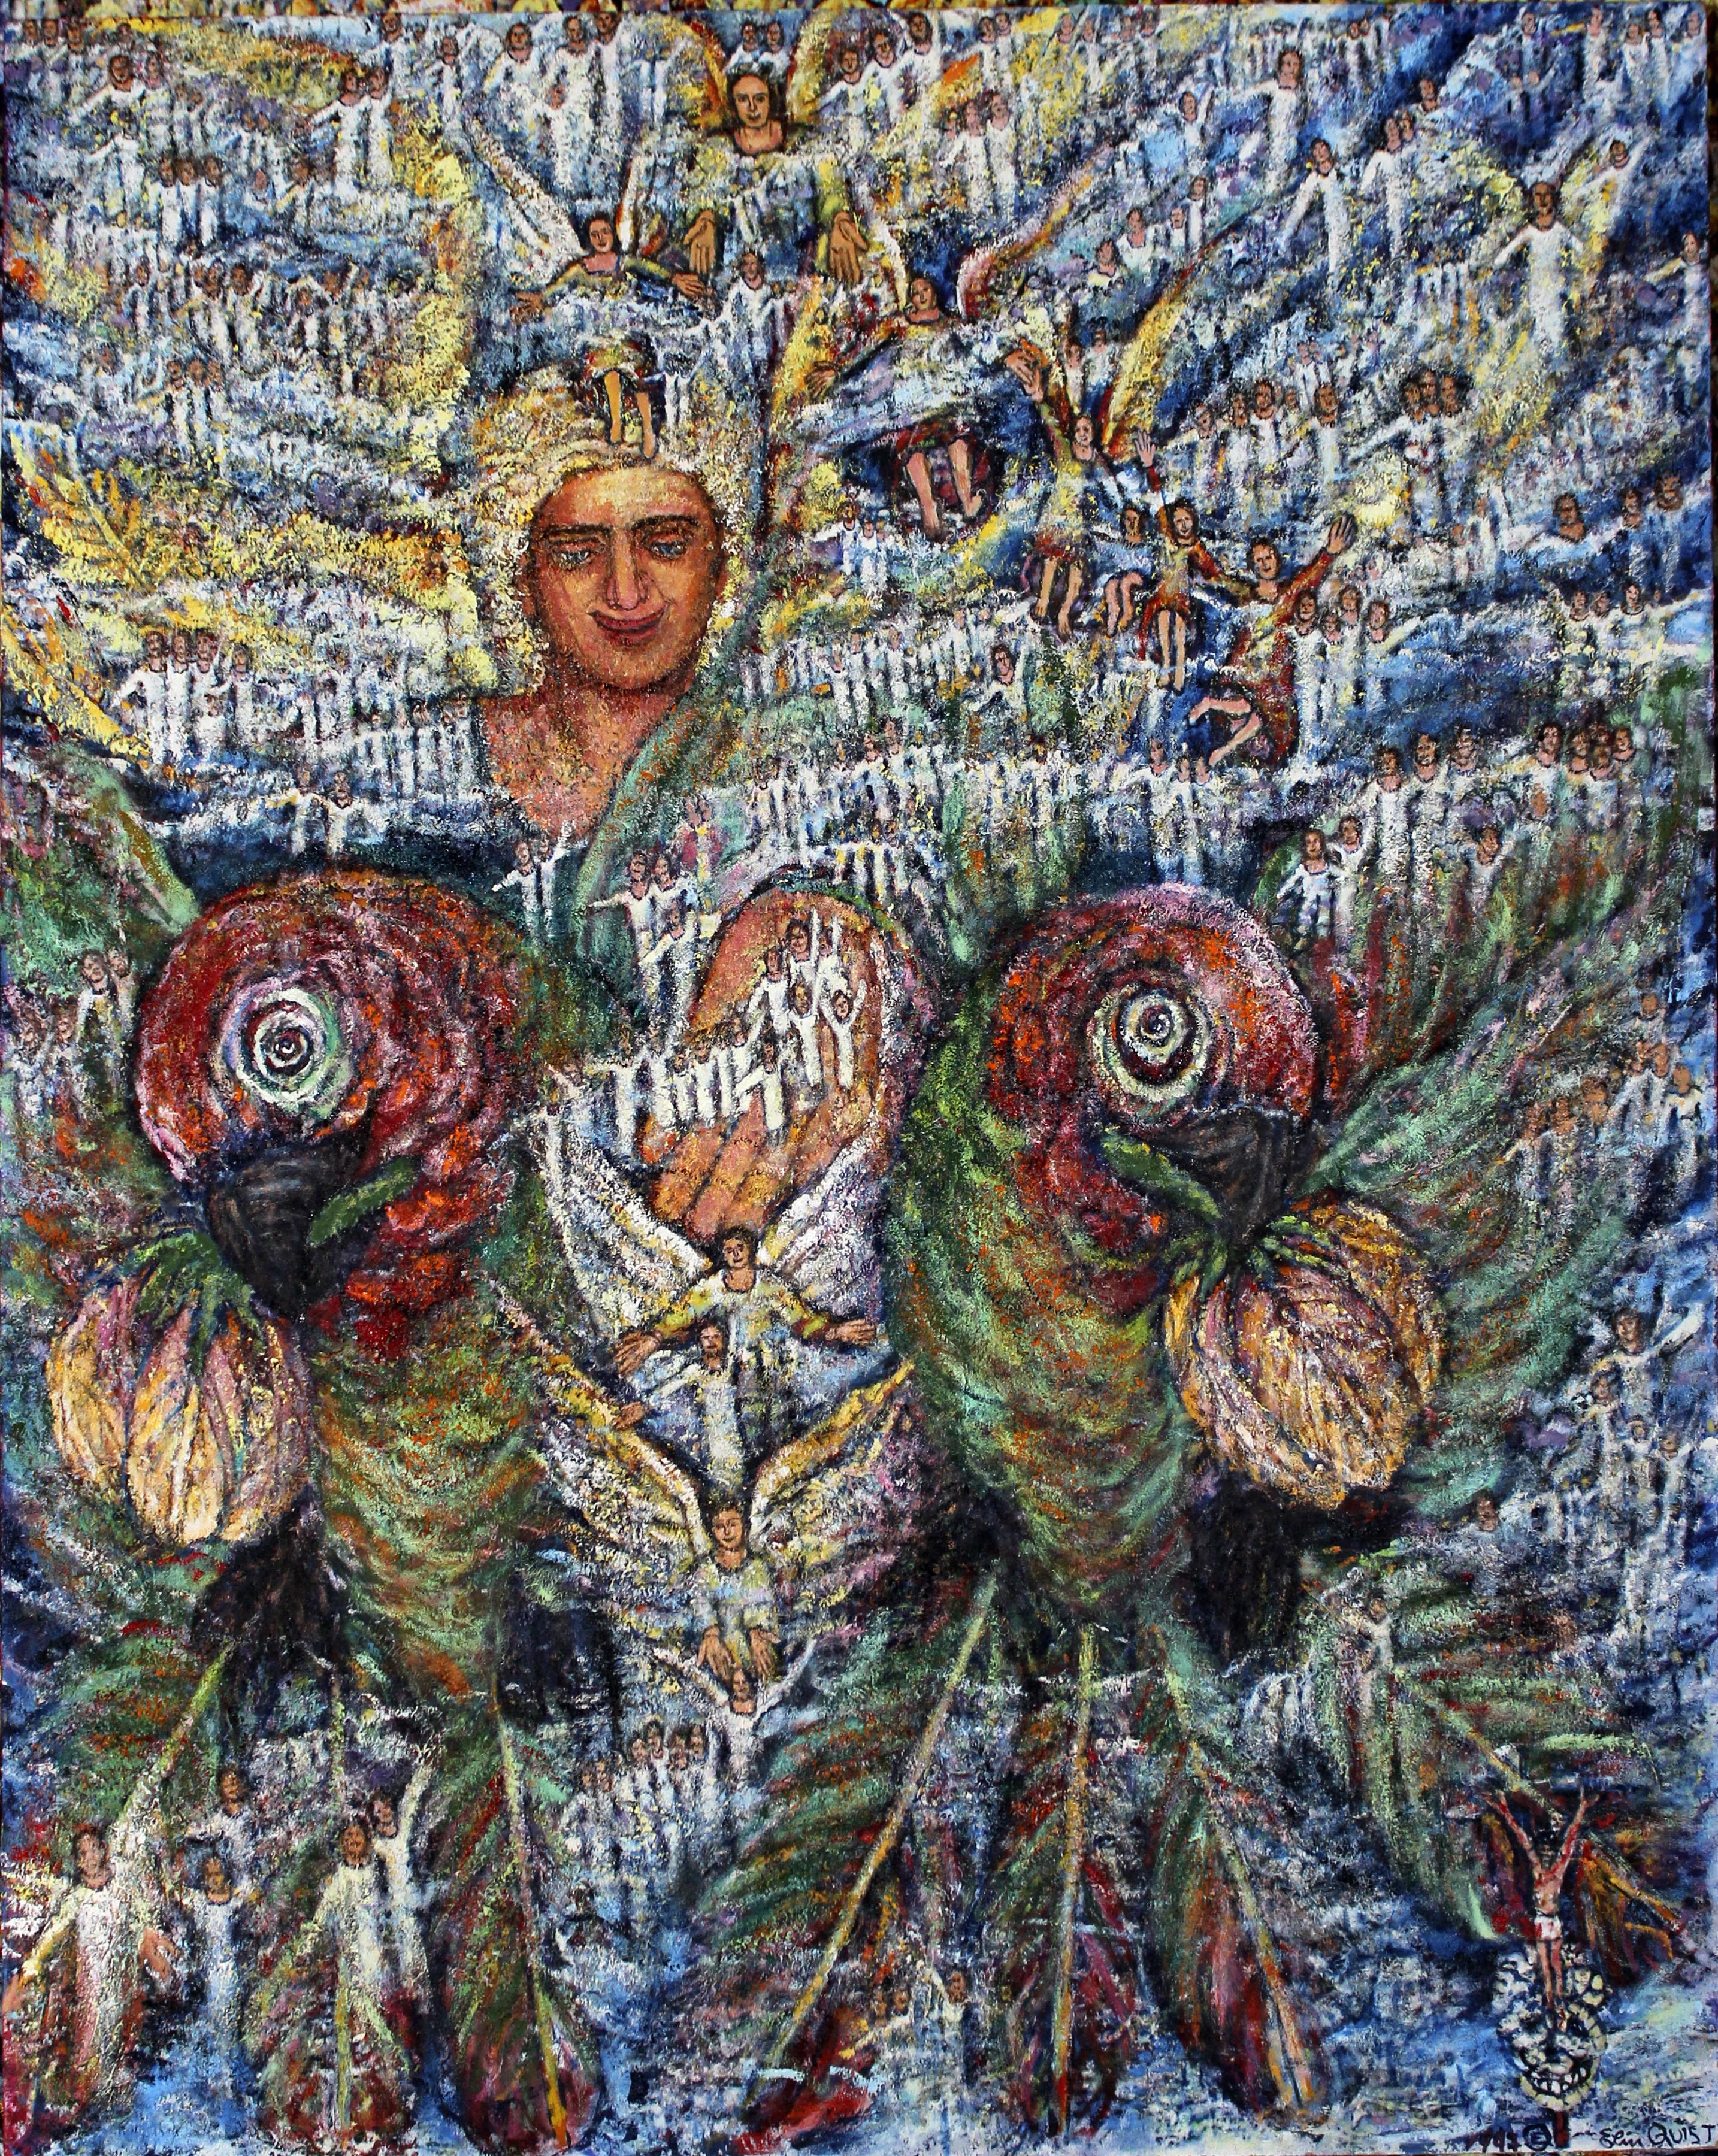 046-engle henter guds boern